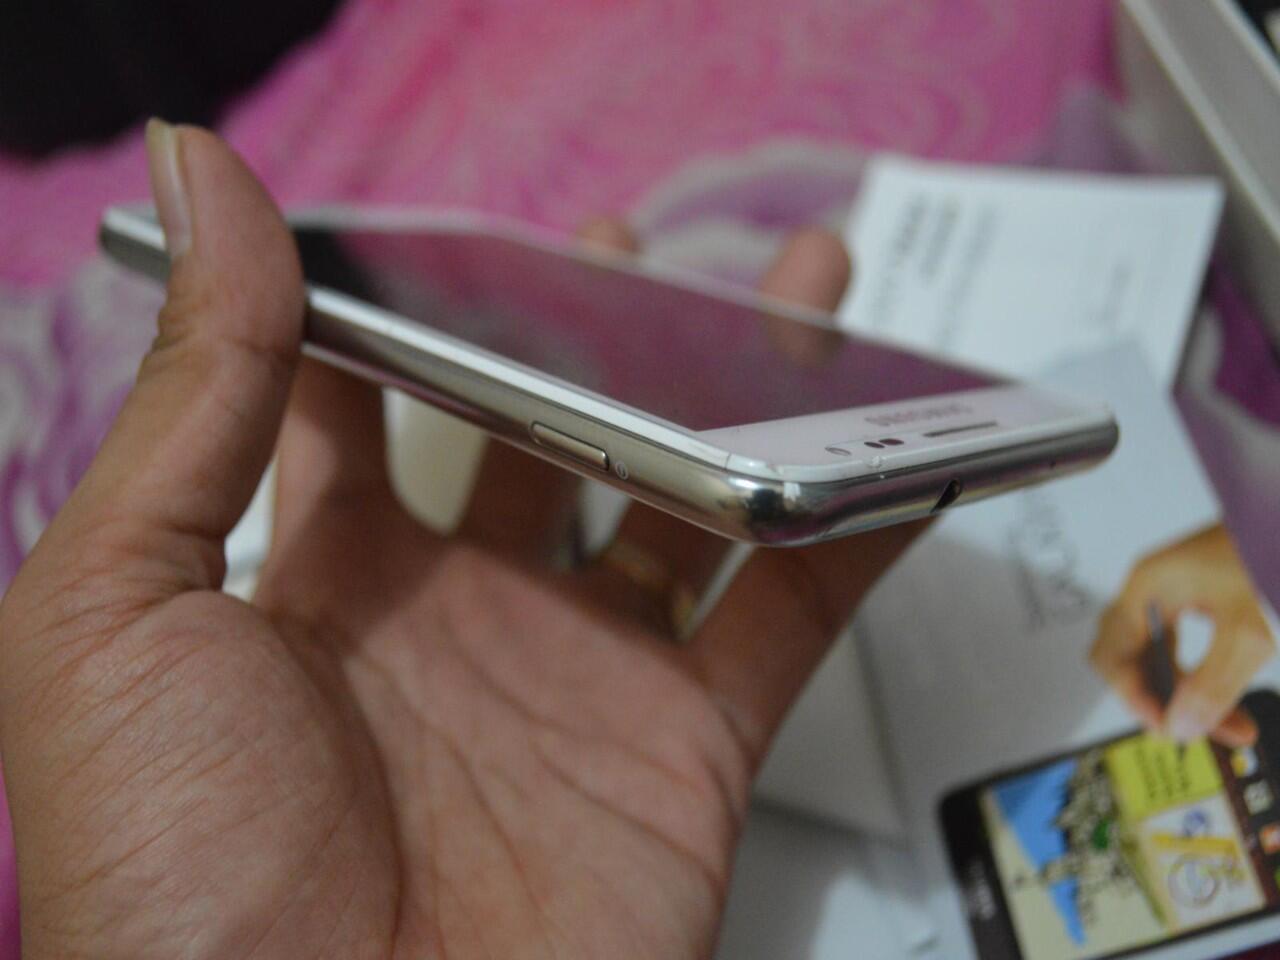 Jual cepat Samsung Galaxy Note 1 N7000 putih monggo mampir gan....